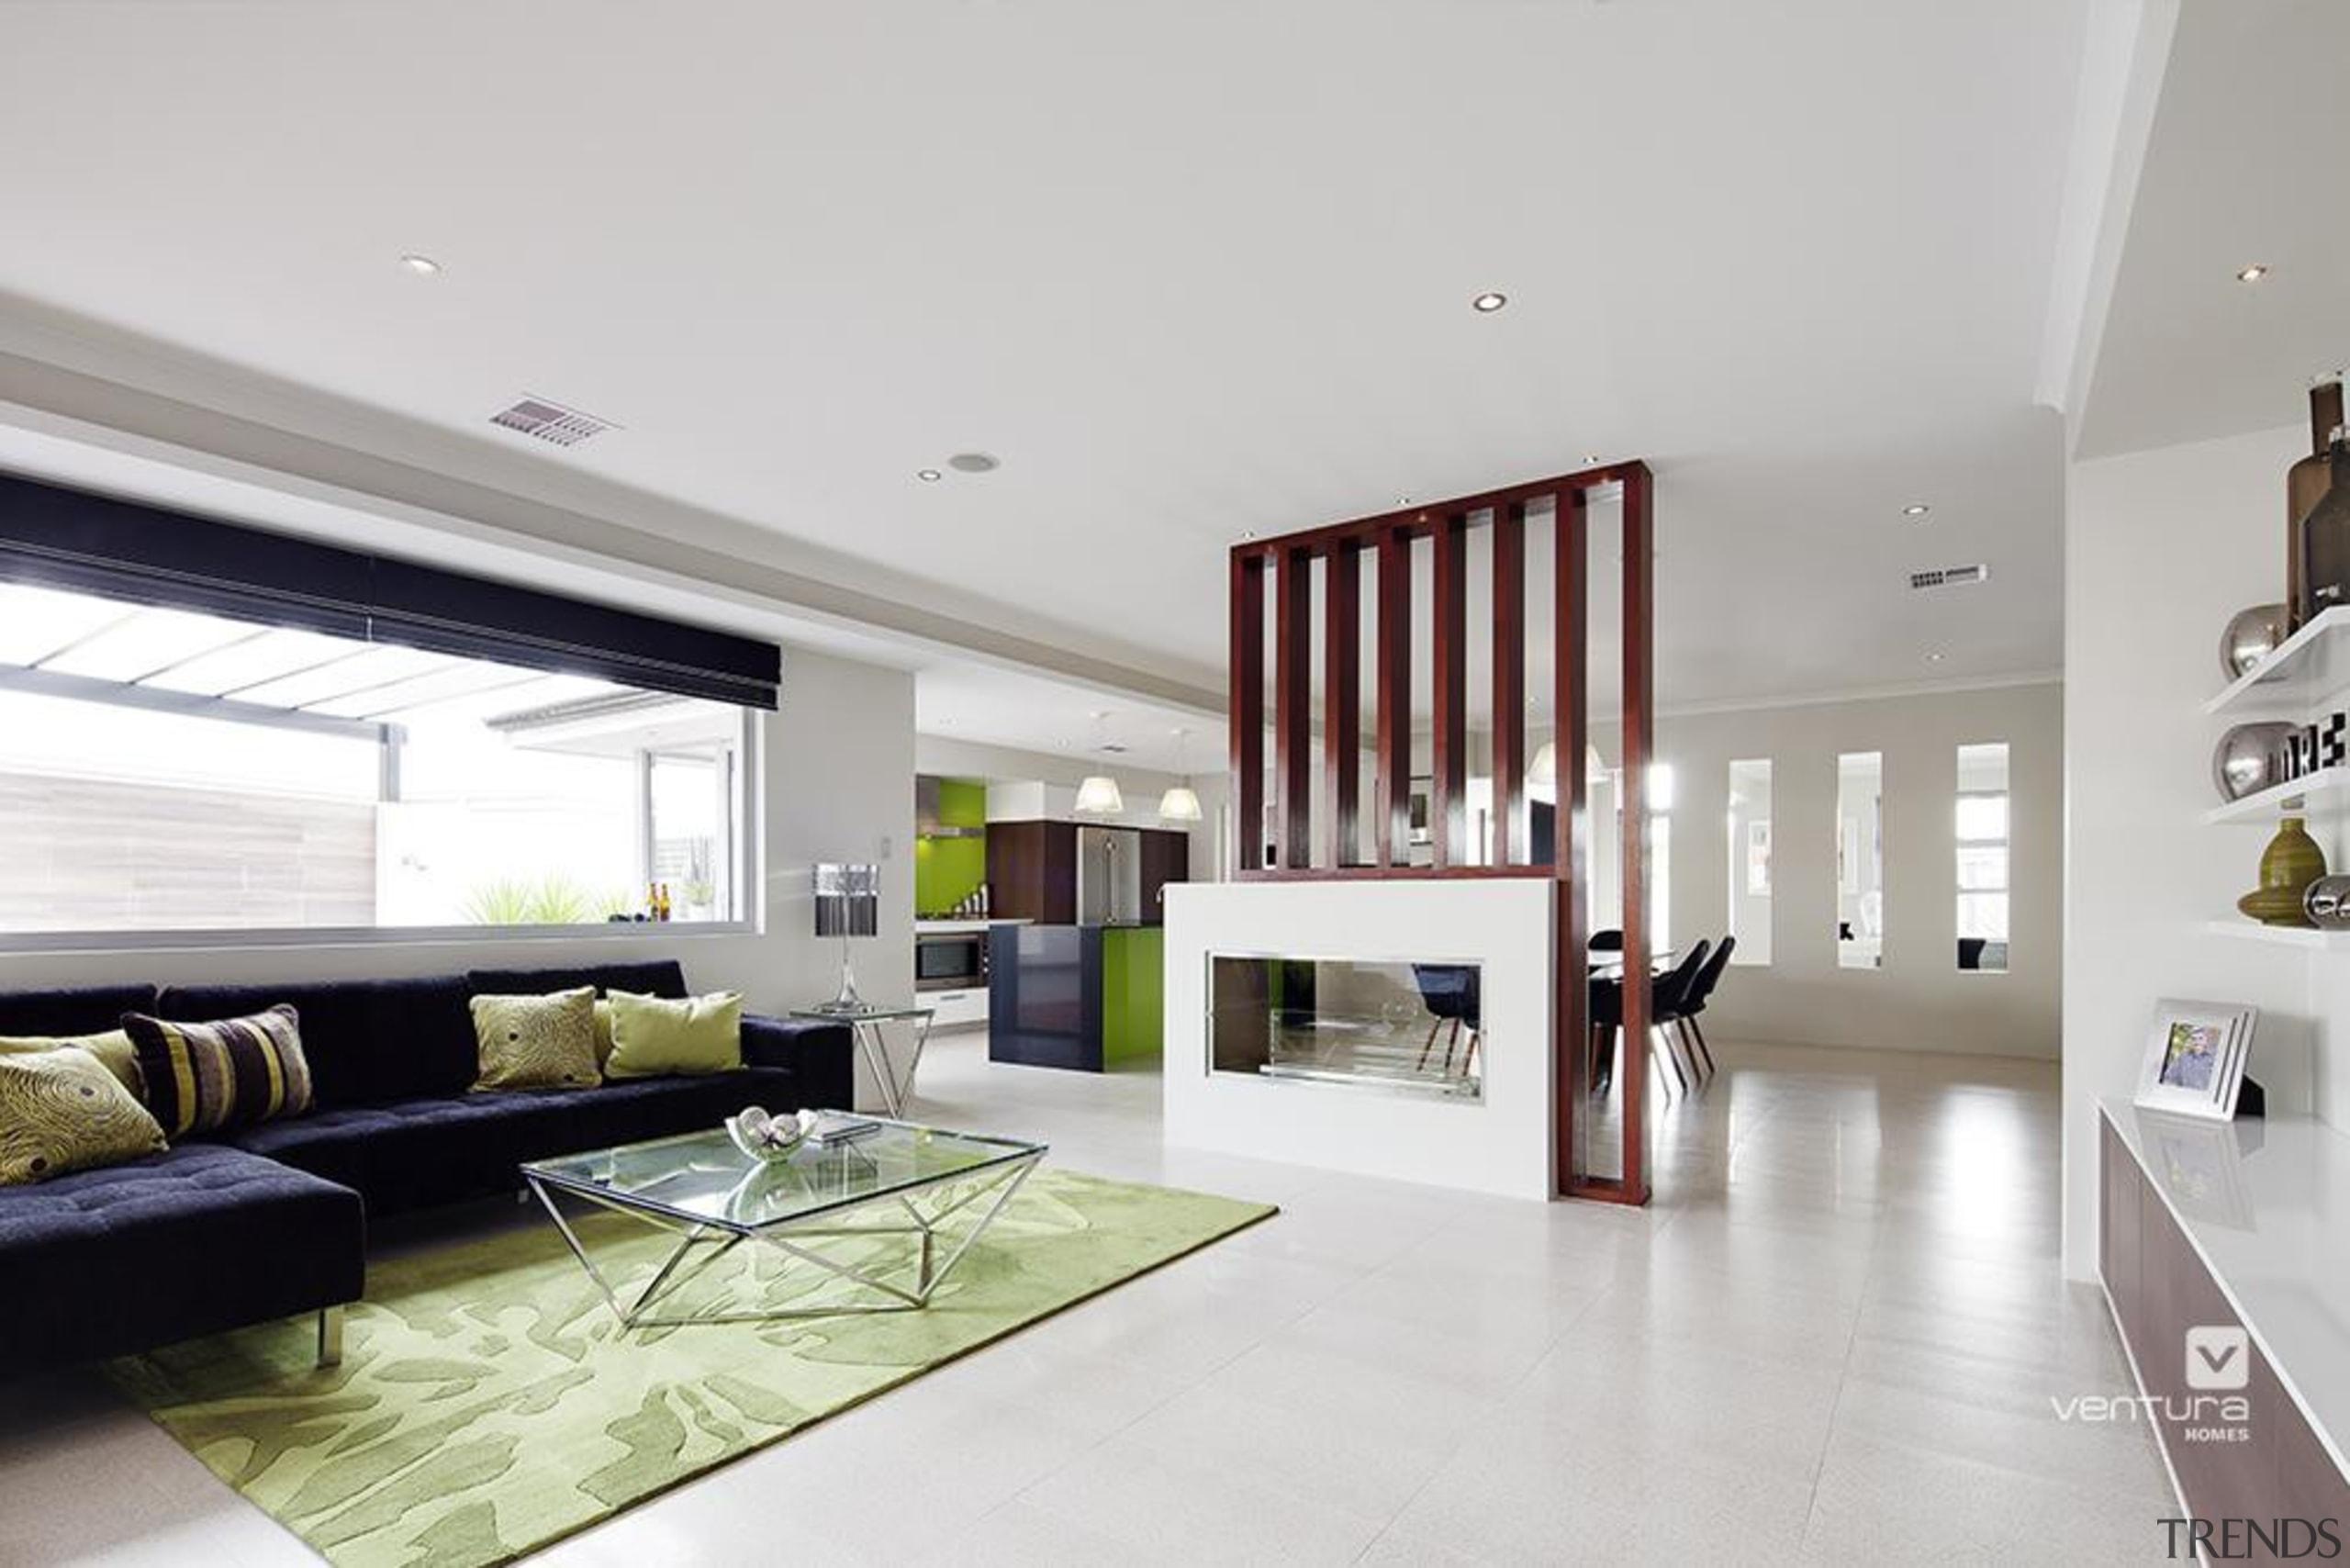 Living Room Design. - The Spectrum Display Home ceiling, floor, flooring, house, interior design, living room, property, real estate, window, gray